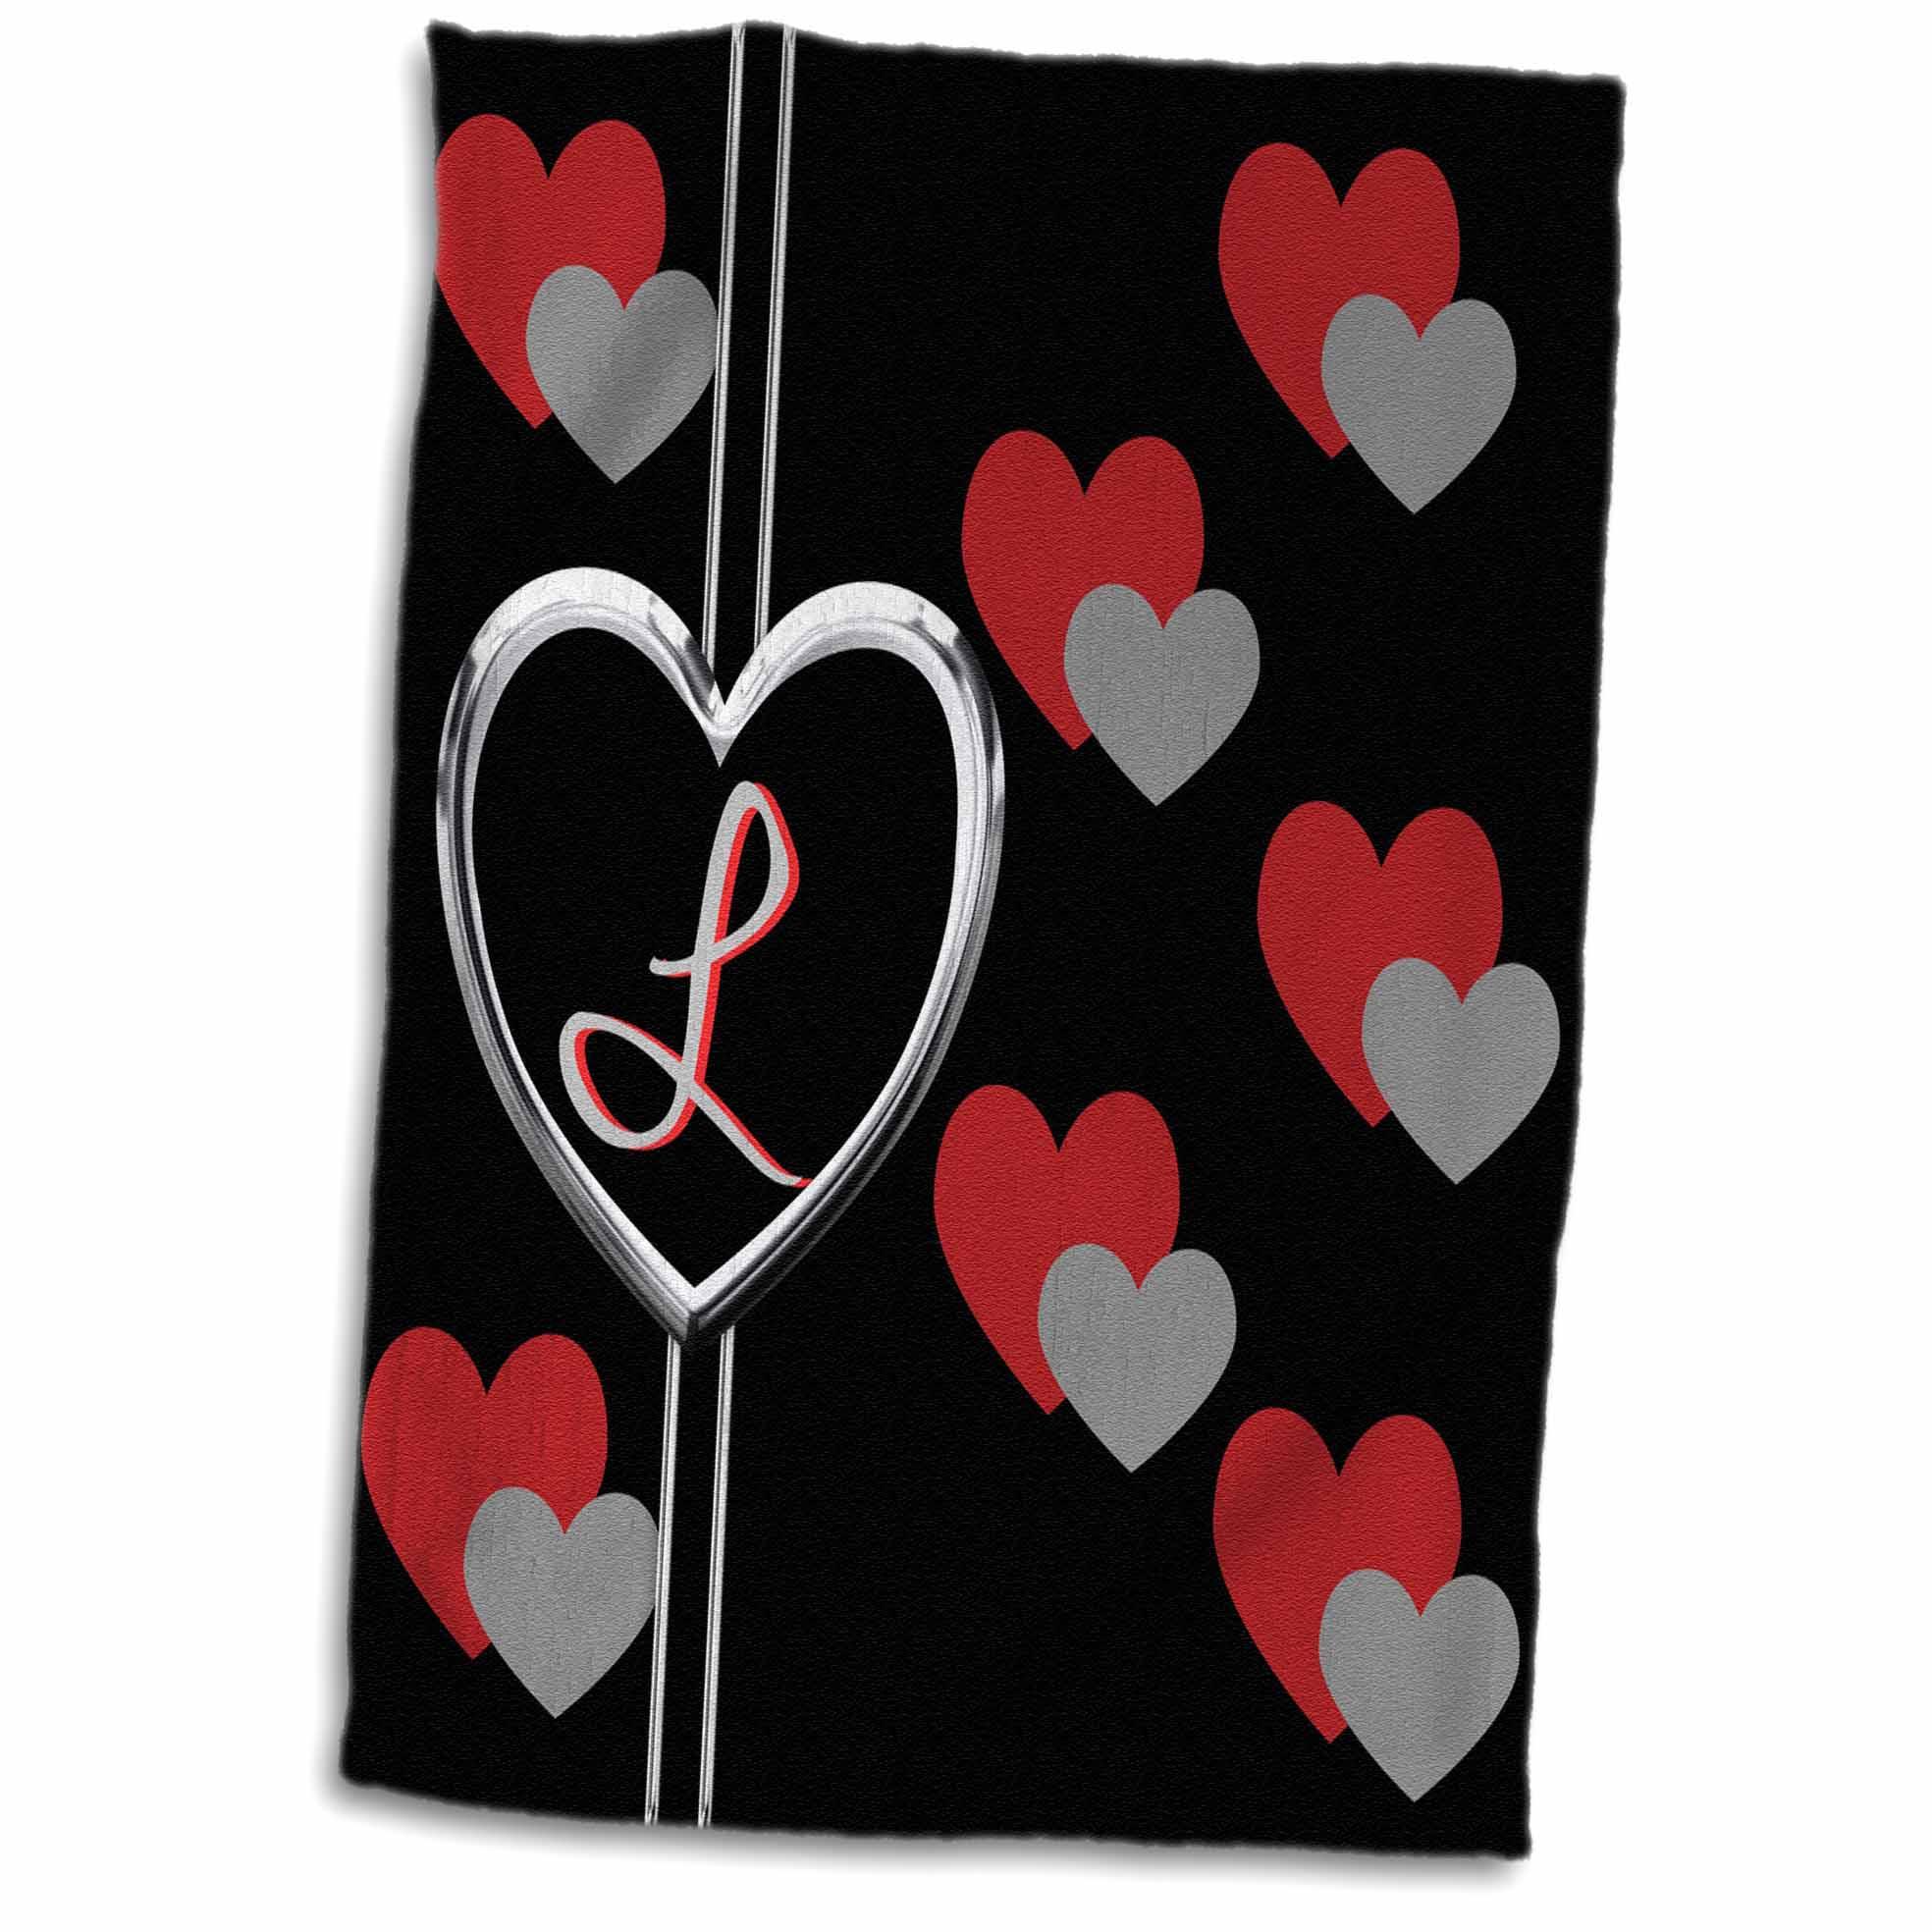 3dRose Modern Geometric Black Red Grey Hearts Pattern Monogram Letter L - Towel, 15 by 22-inch